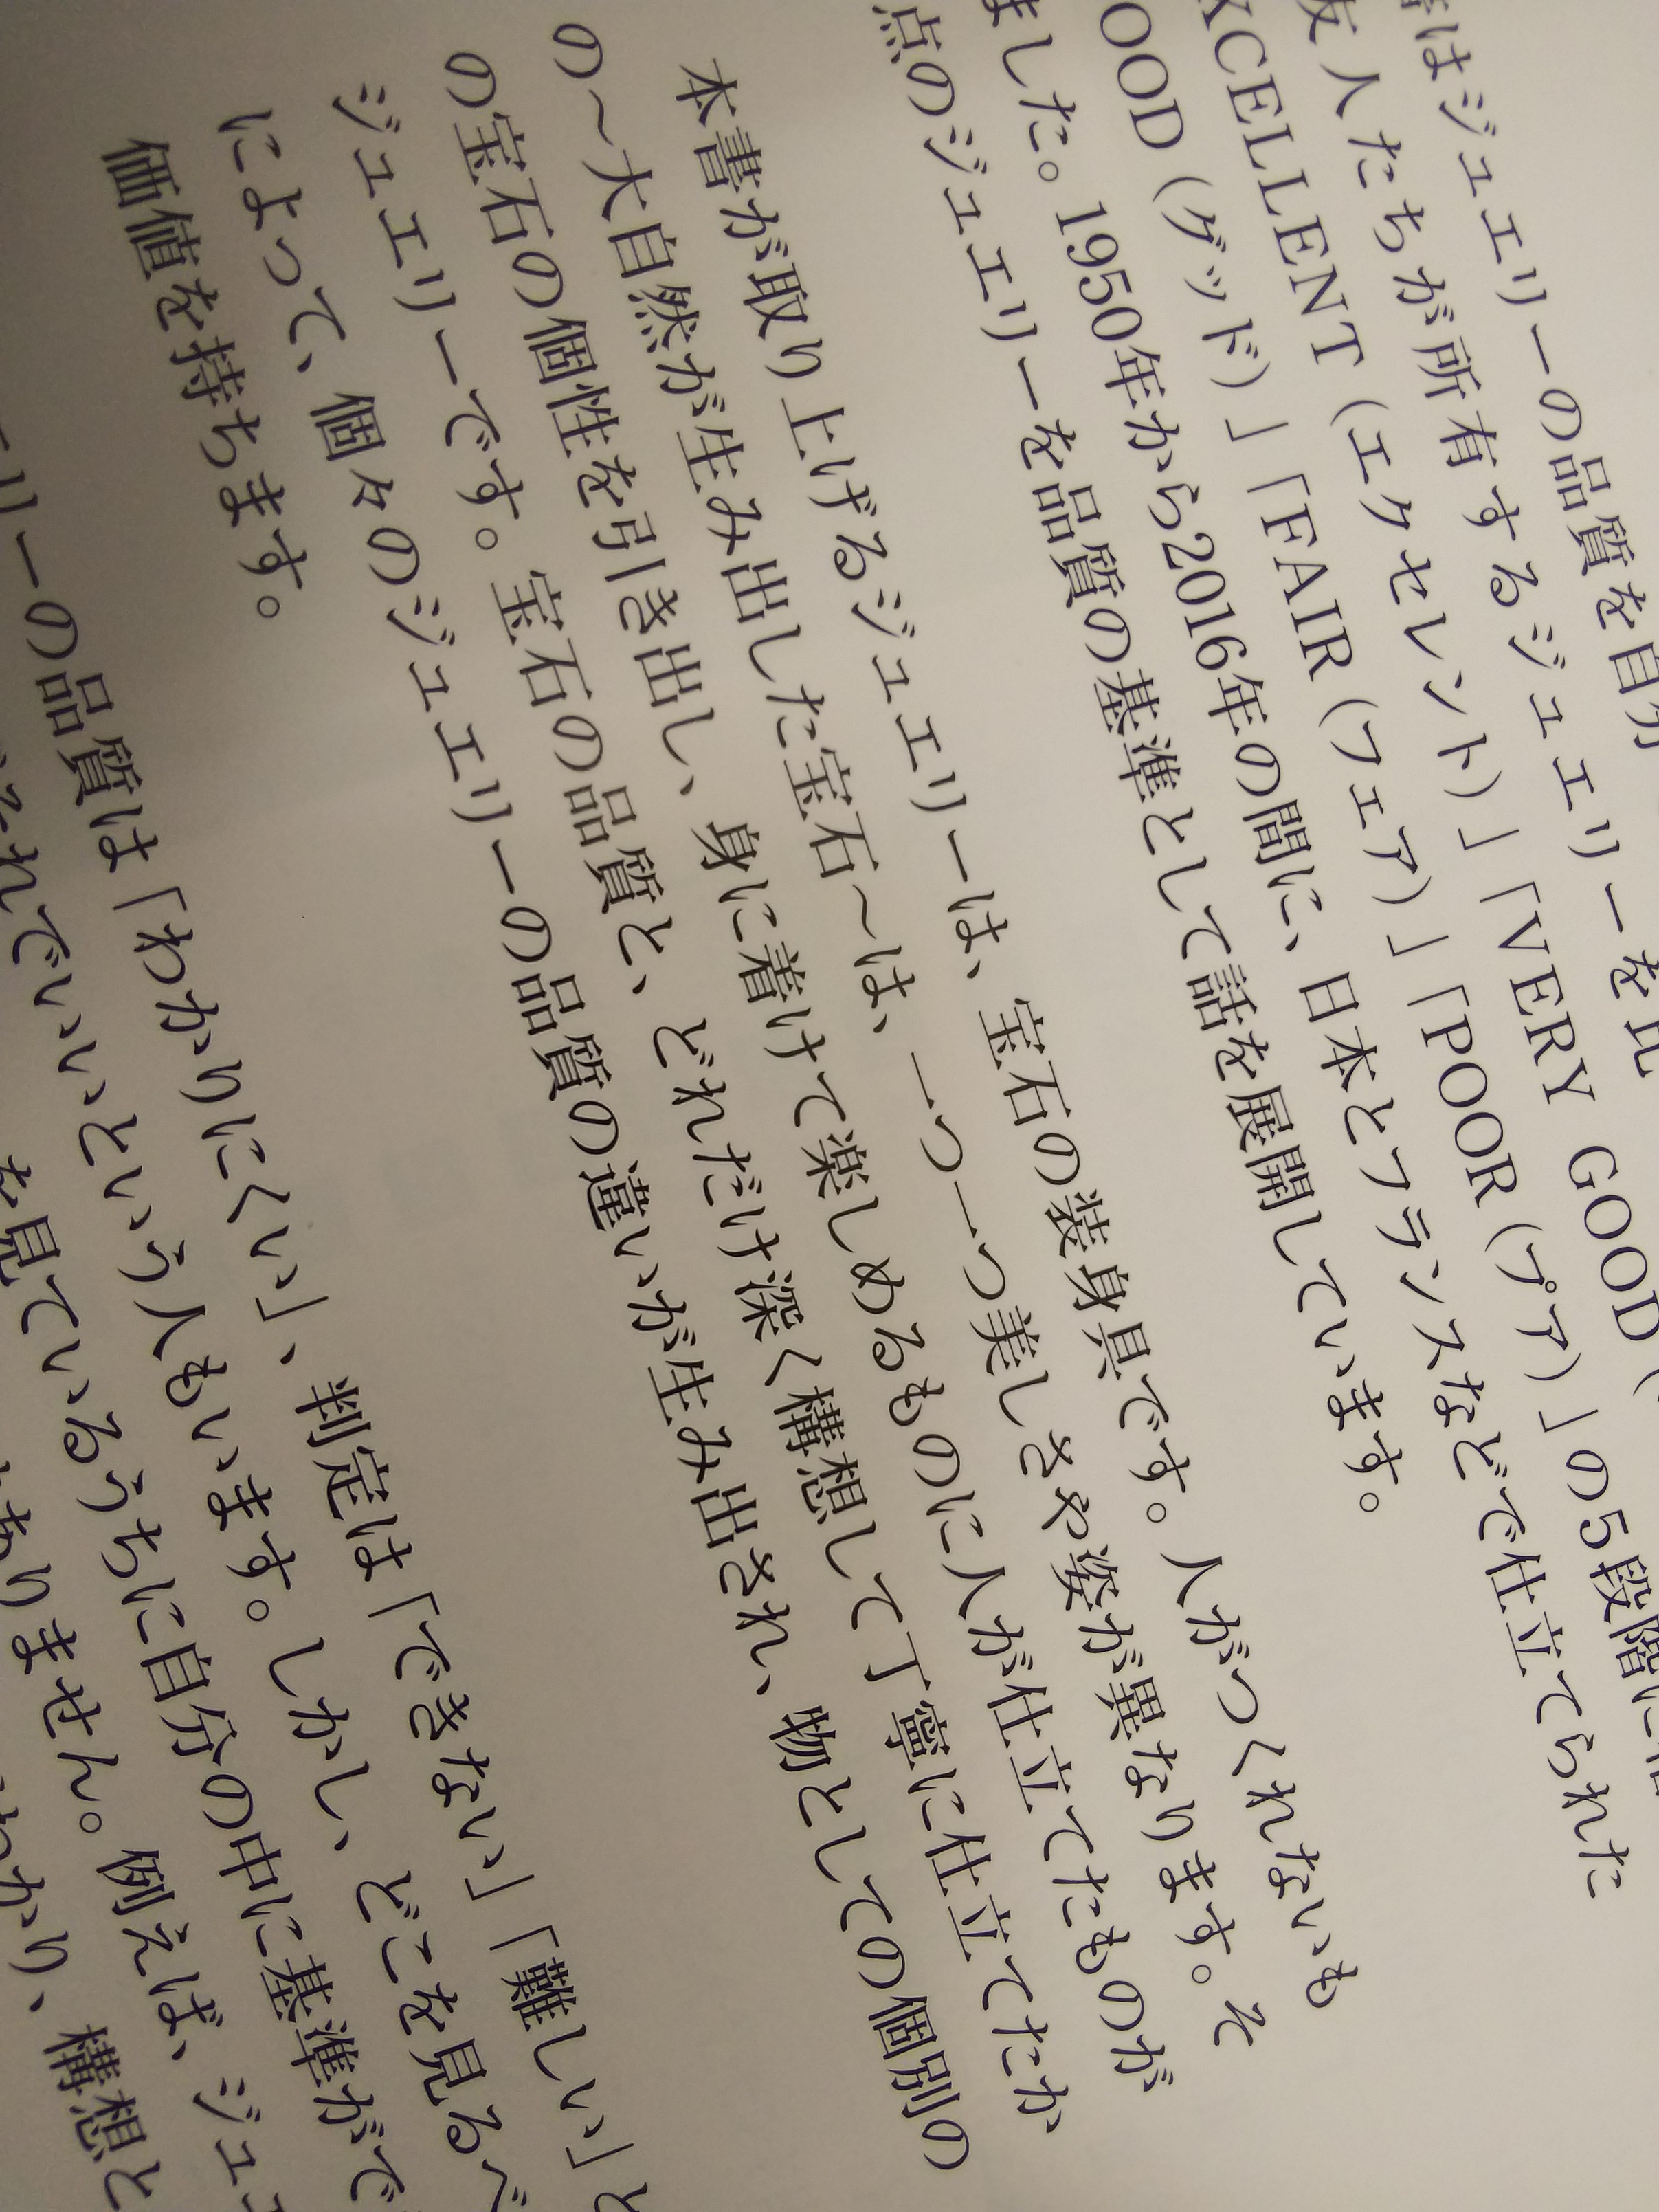 DSC_6792.JPG